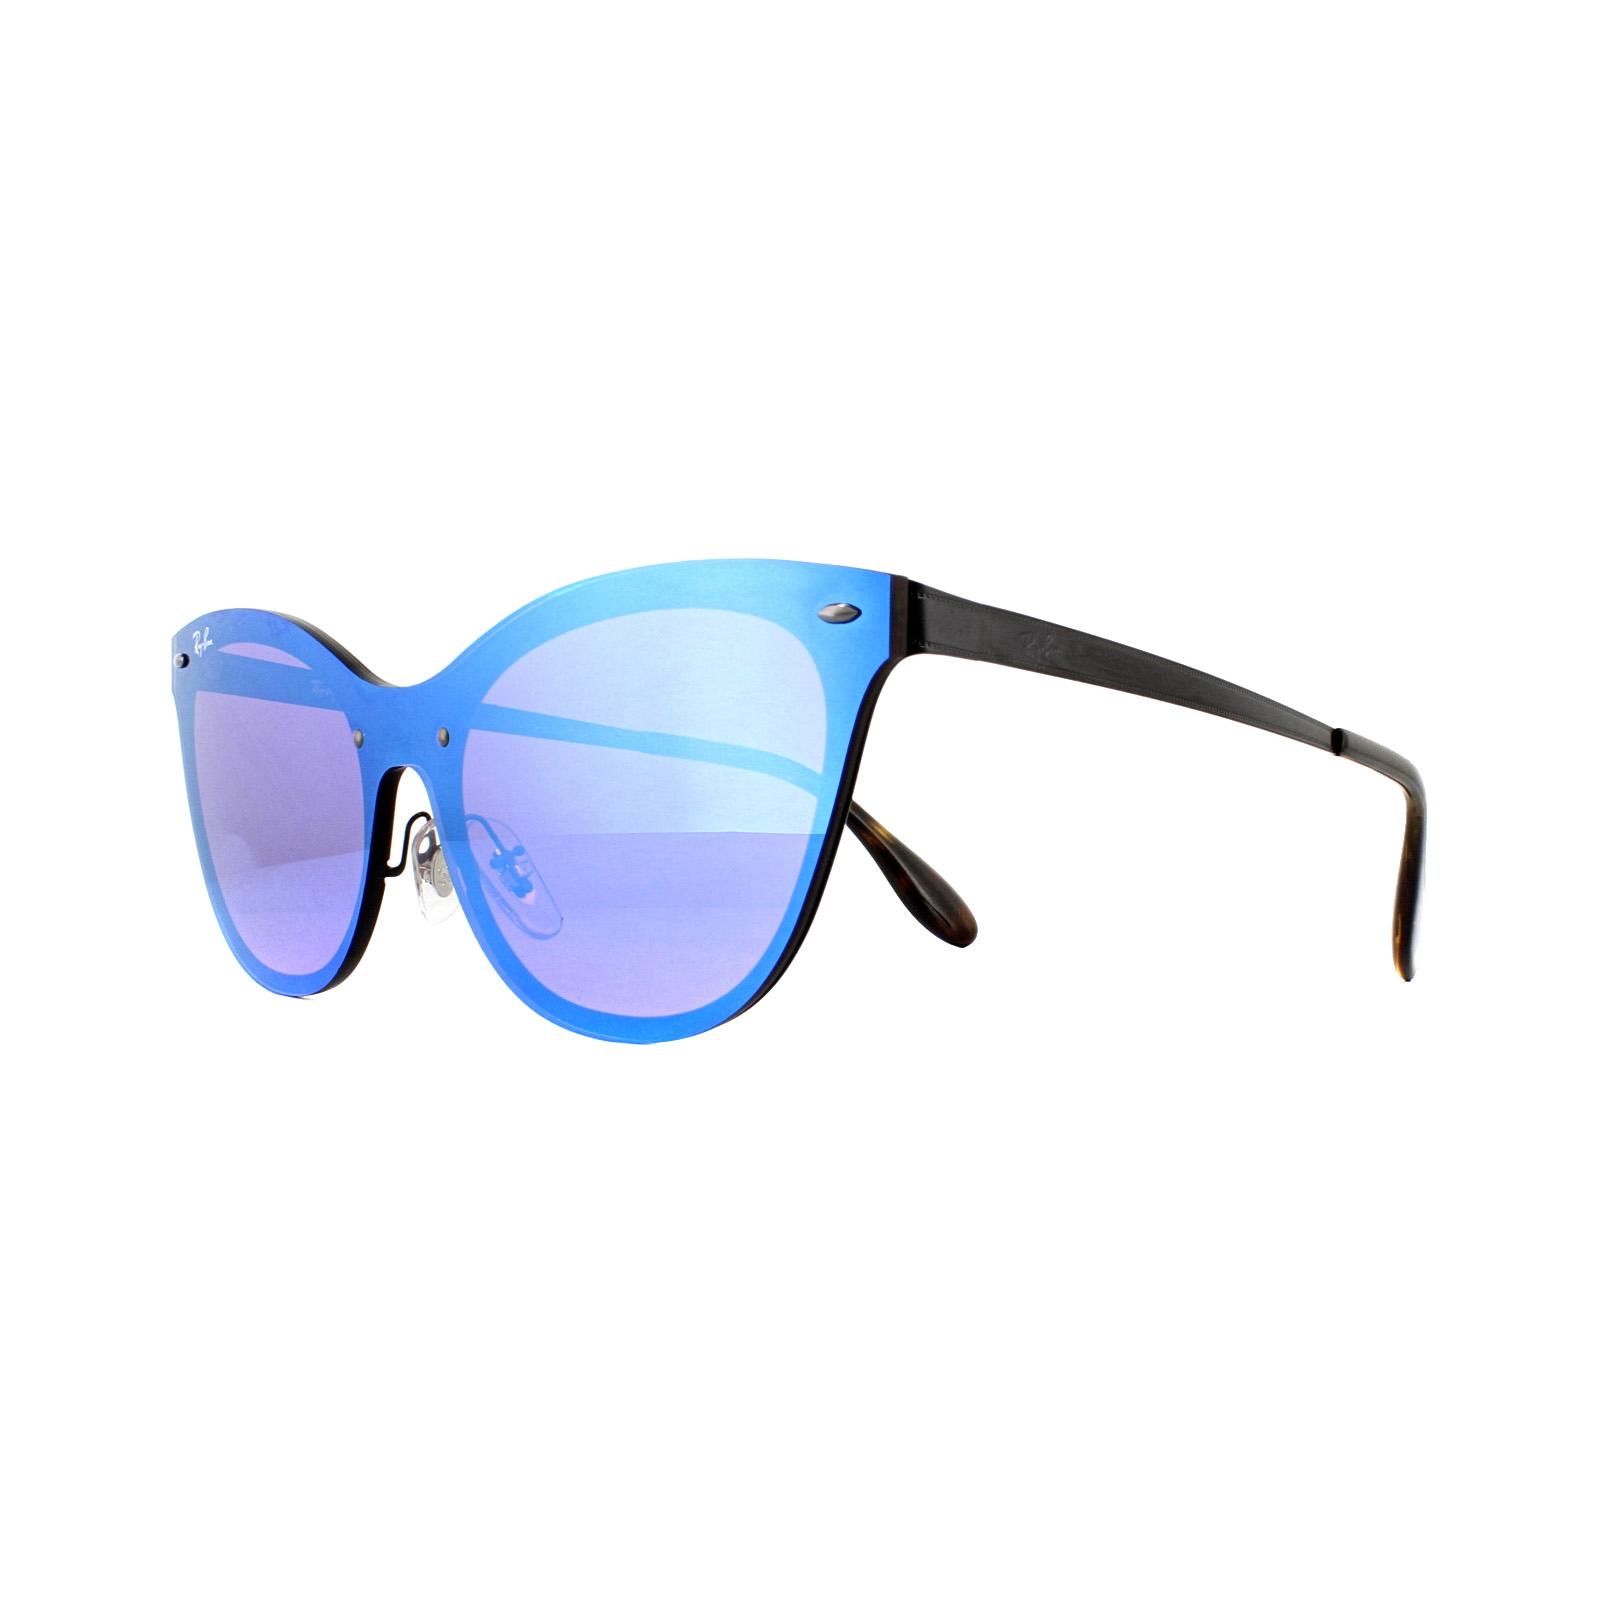 31229be8f5e Sentinel Ray-Ban Sunglasses Blaze Cat Eye 3580N 153 7V Black Dark Violet  Mirror Blue